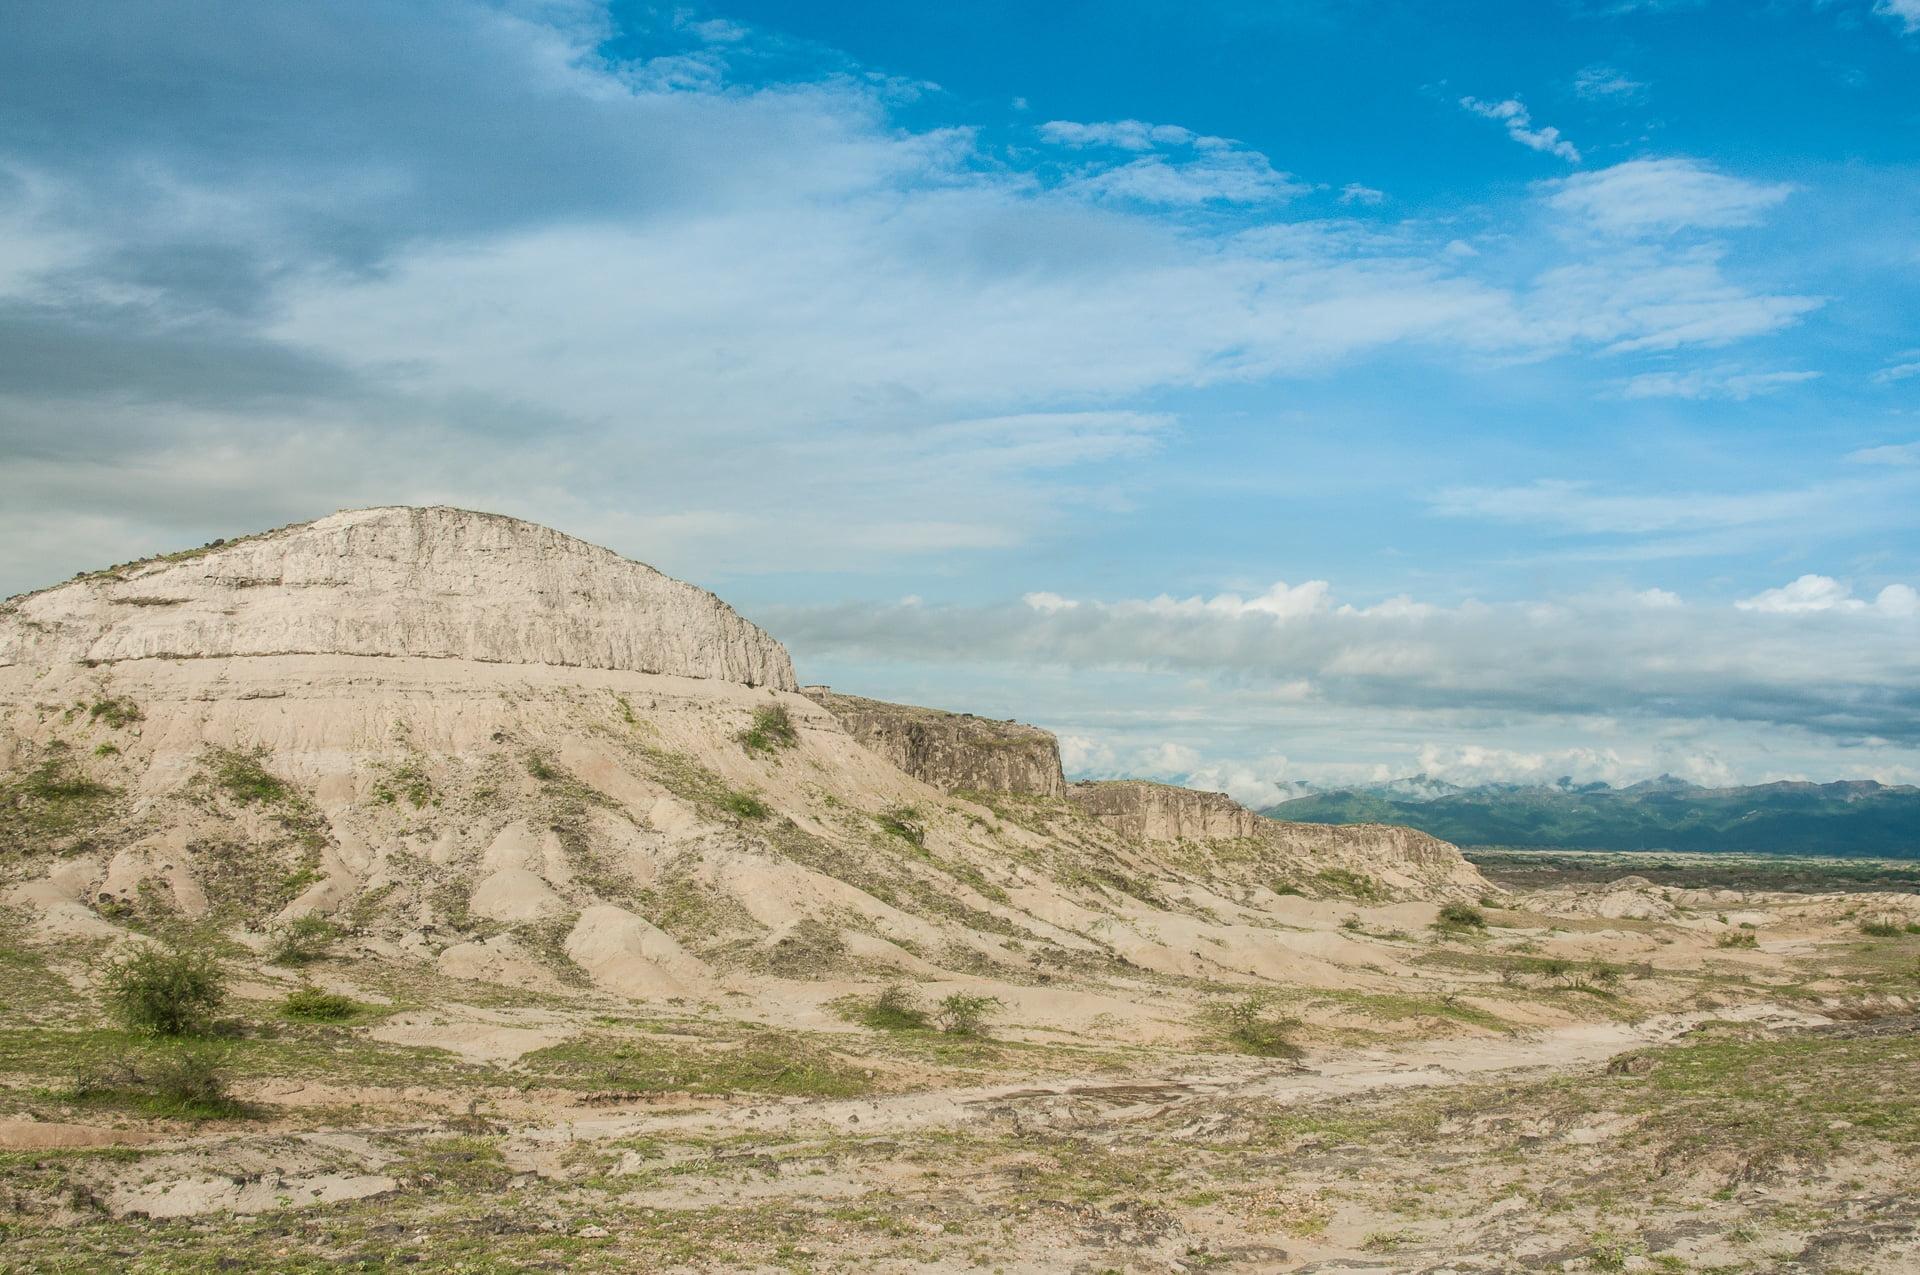 tatacoa desert blanc - Les globe blogueurs - blog voyage nature